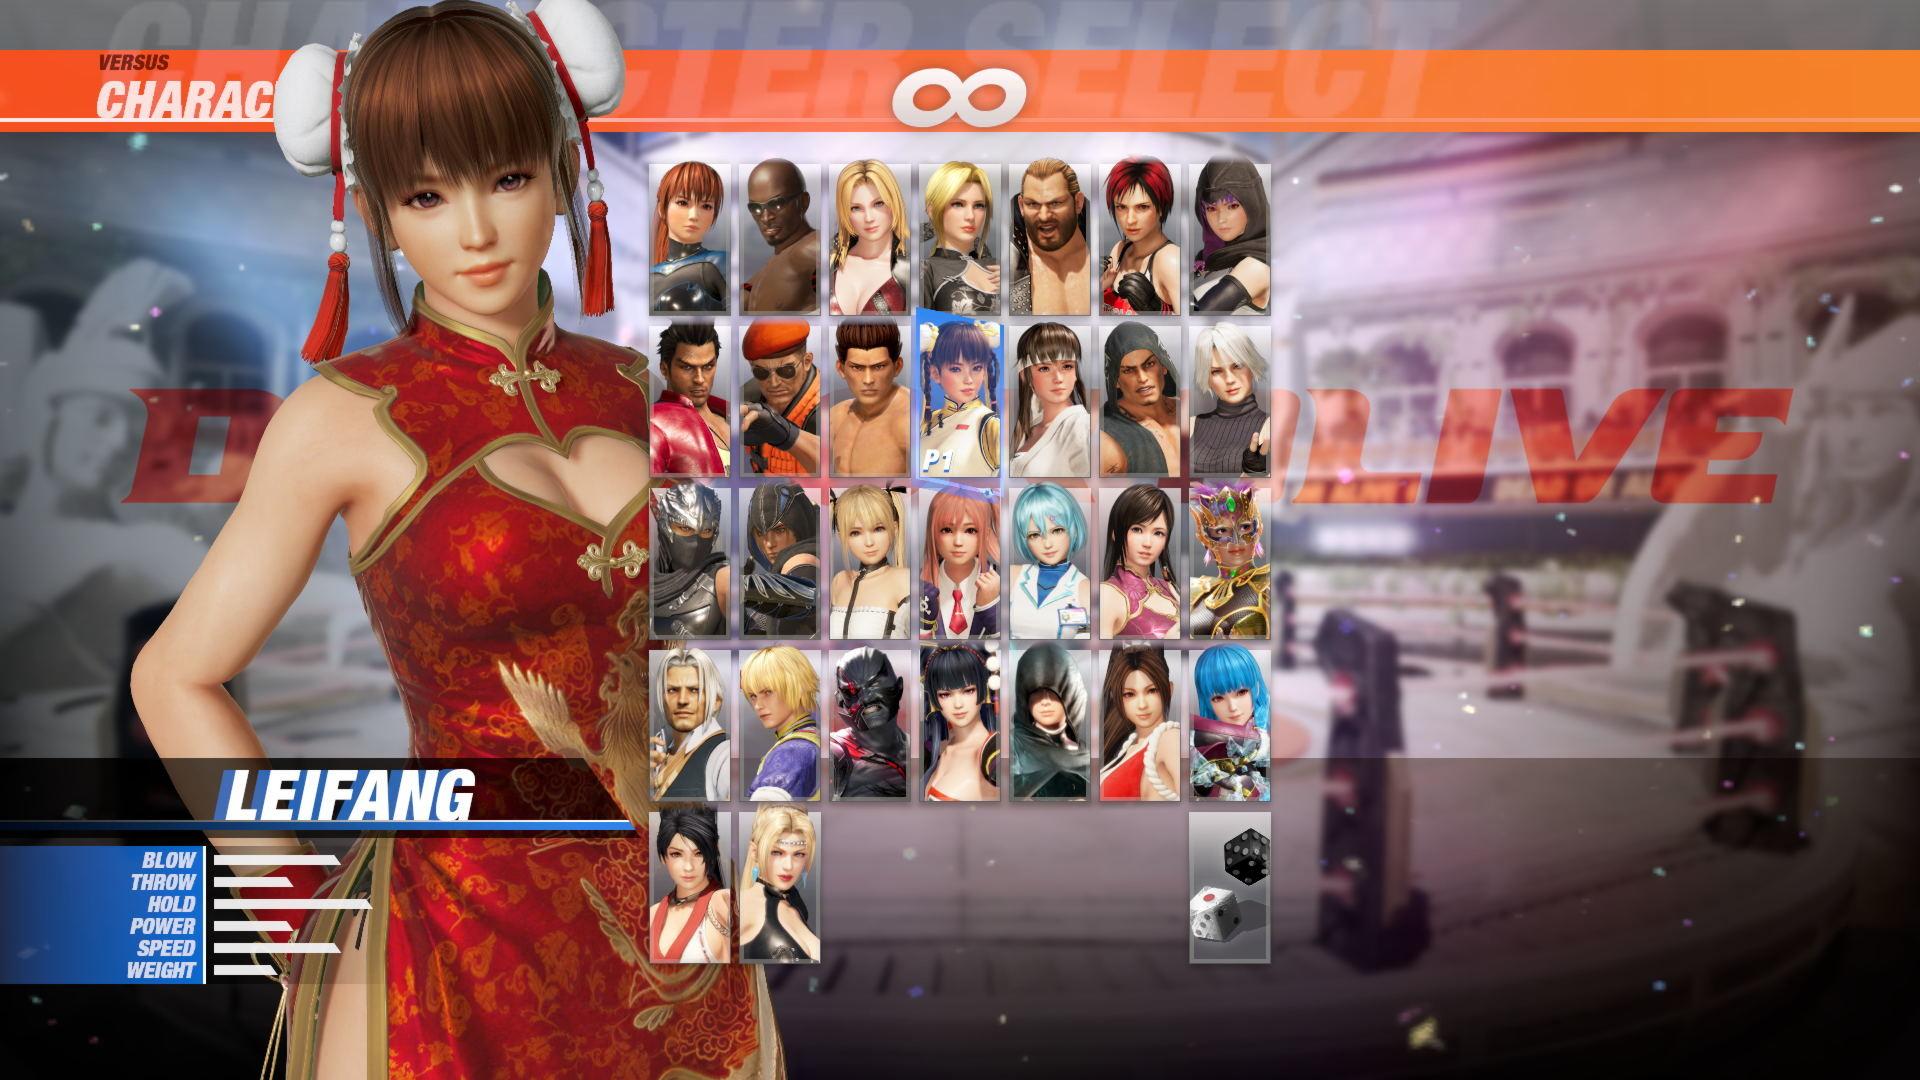 [Revival] DOA6 Alluring Mandarin Dress - Leifang screenshot